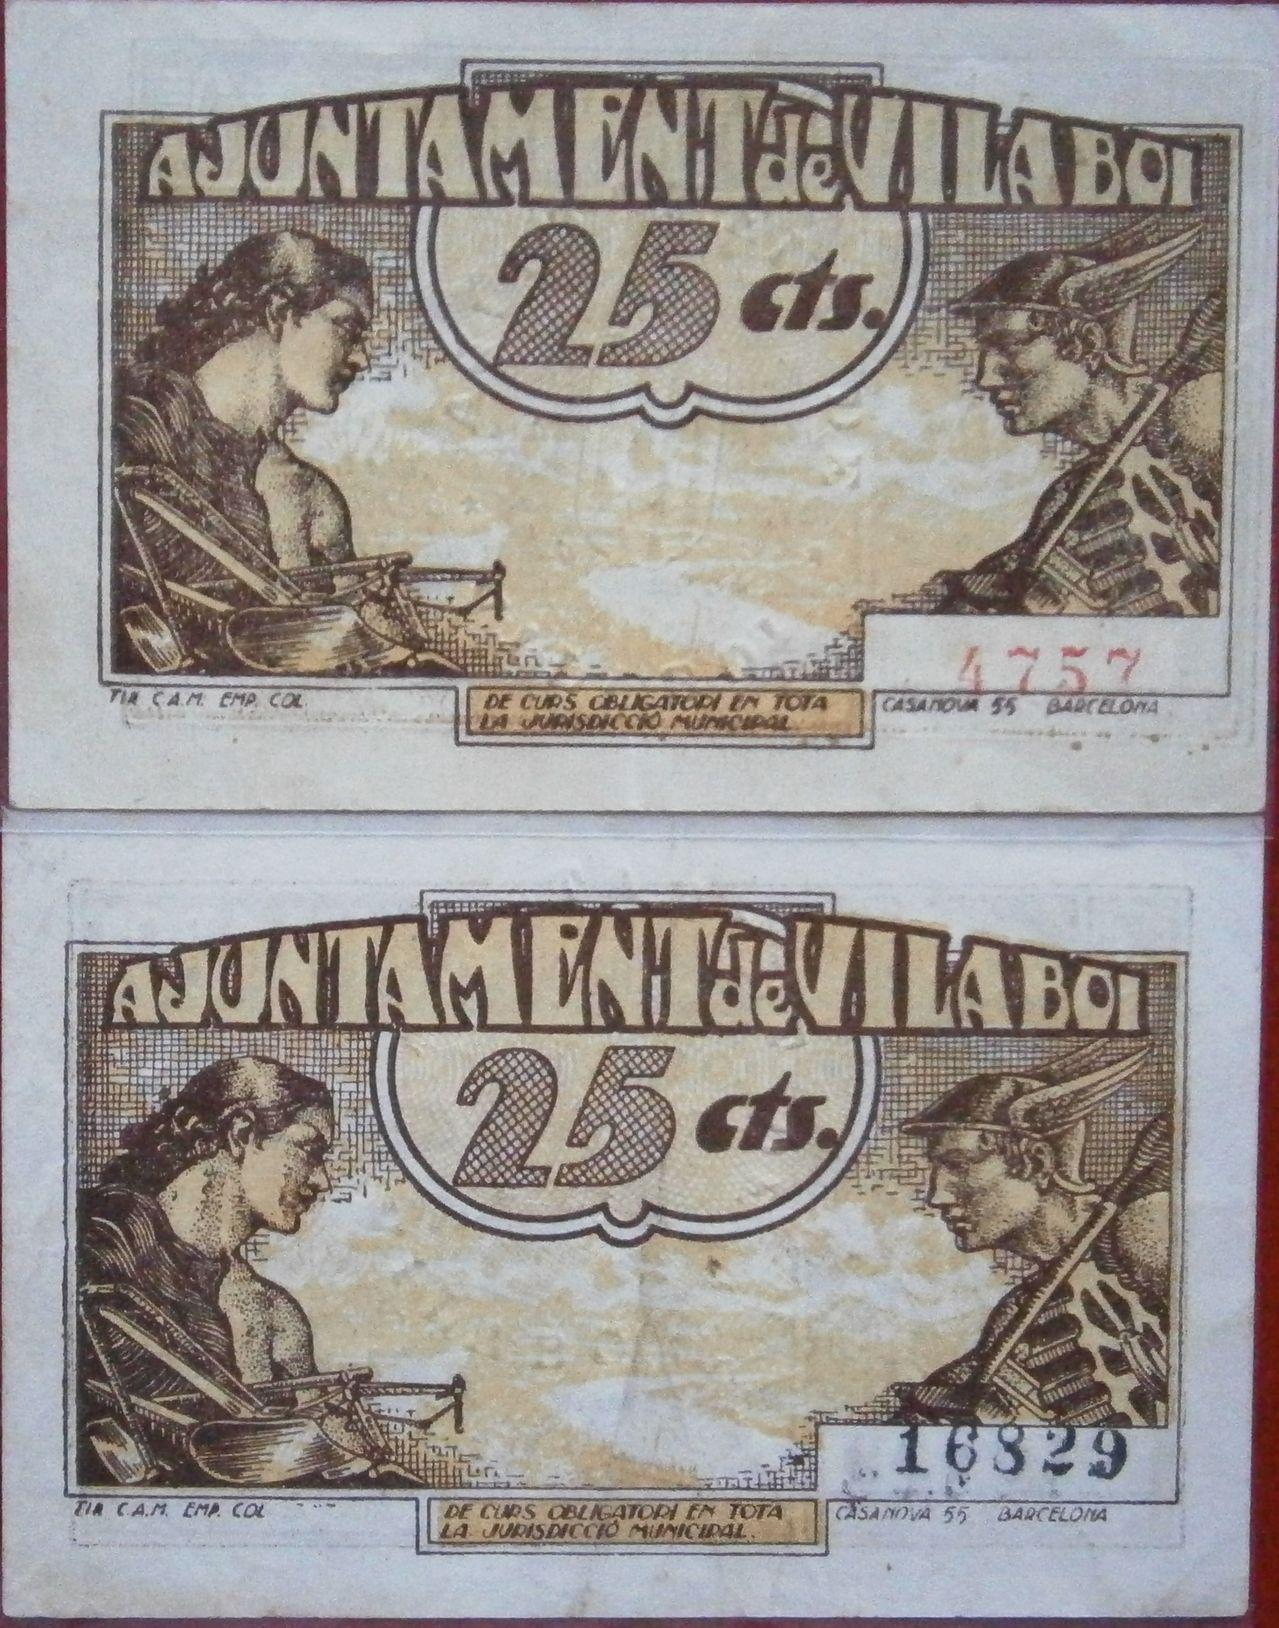 Vilaboi Sant Boi de LLobregat 25 Centimos 1937 Guerra Civil  P1010020